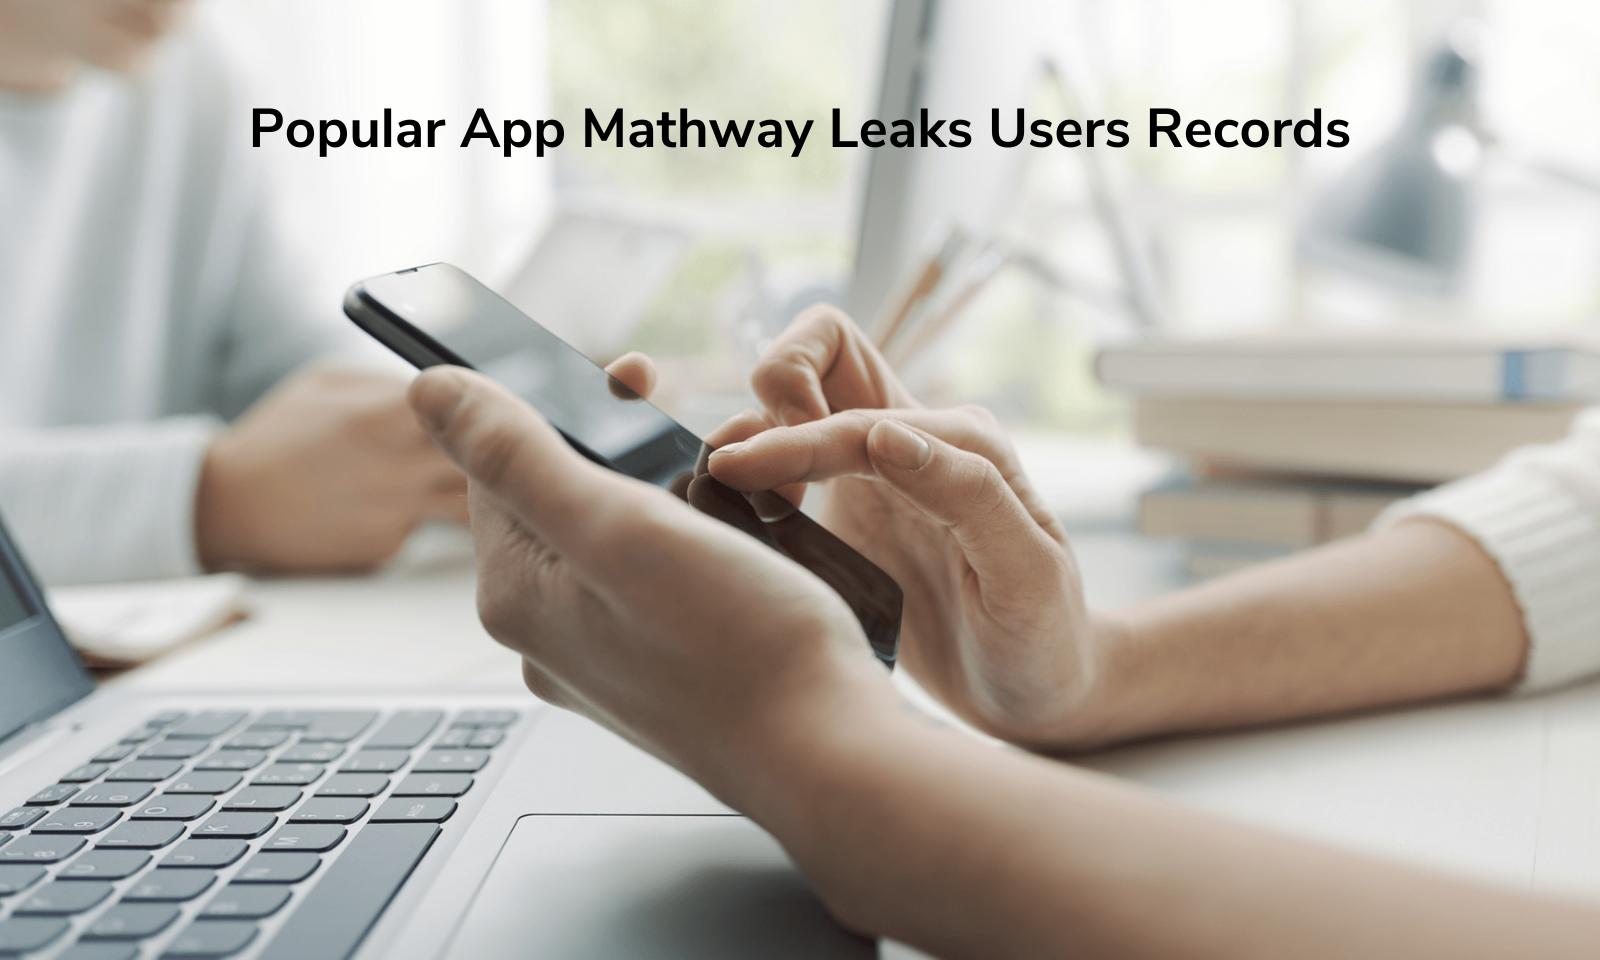 Popular App Mathway Leaks Users Records